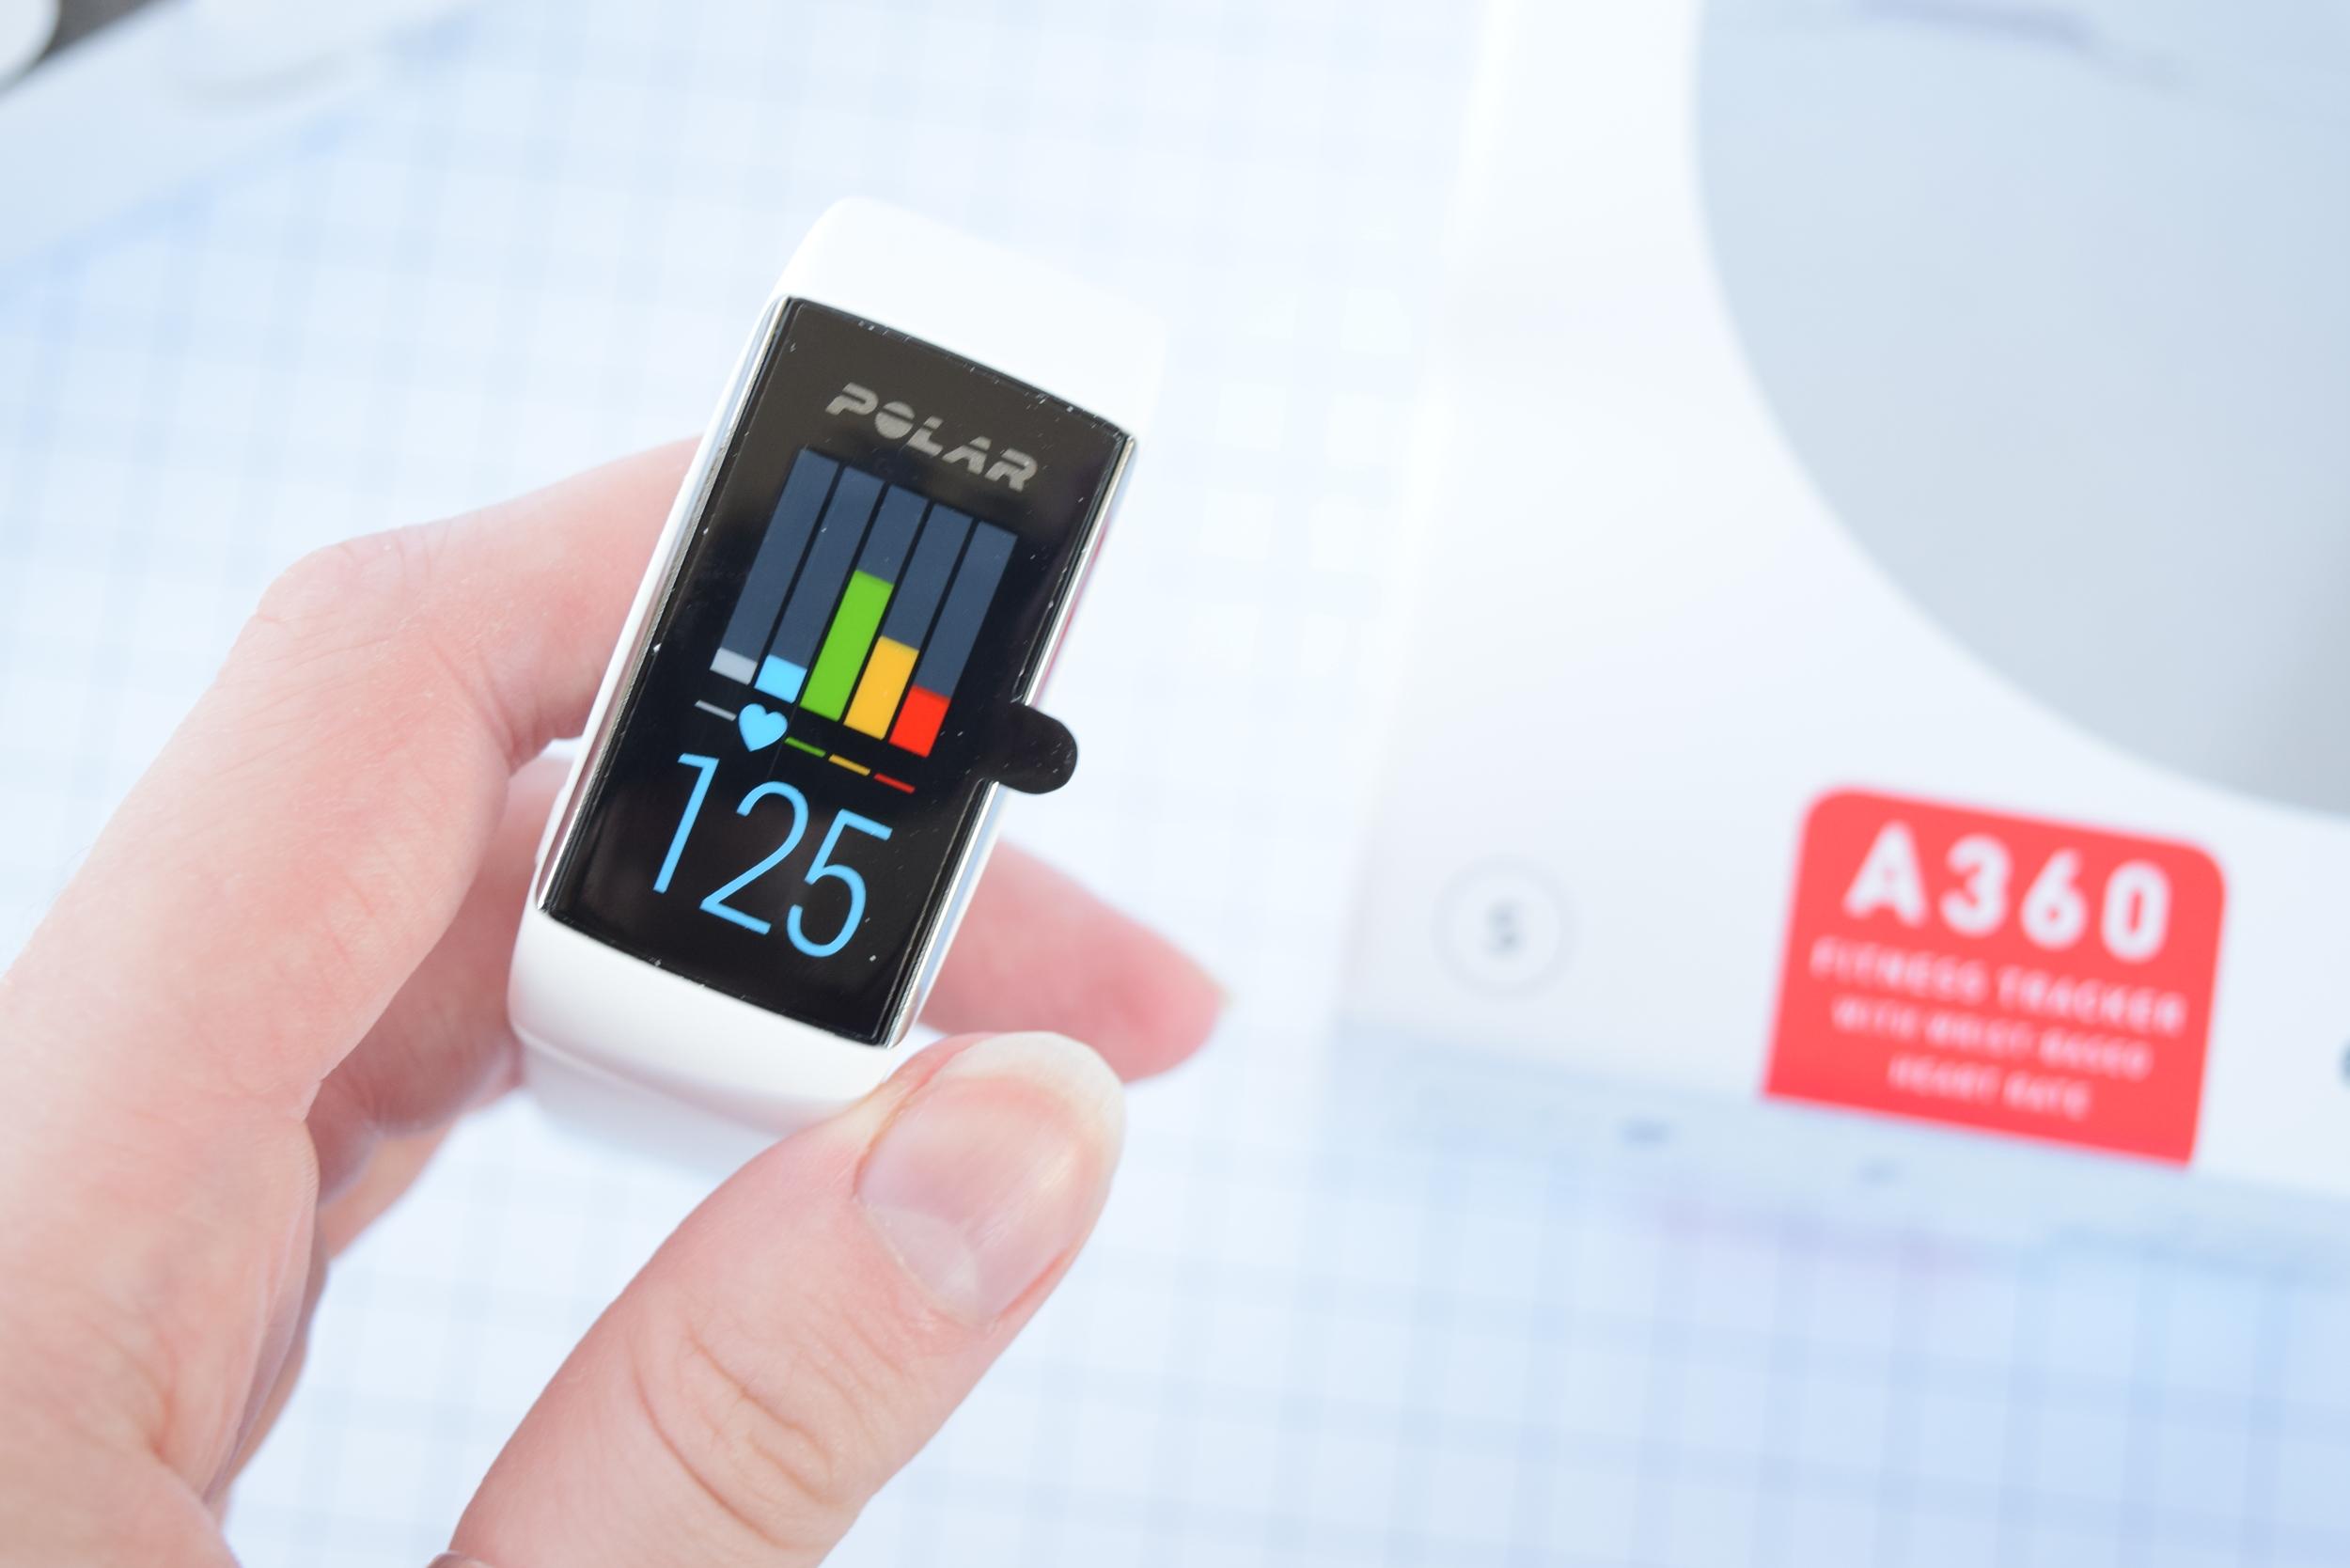 Polar_A360_Heart_Rate_Wrist_Monitor_Fitness-blogger